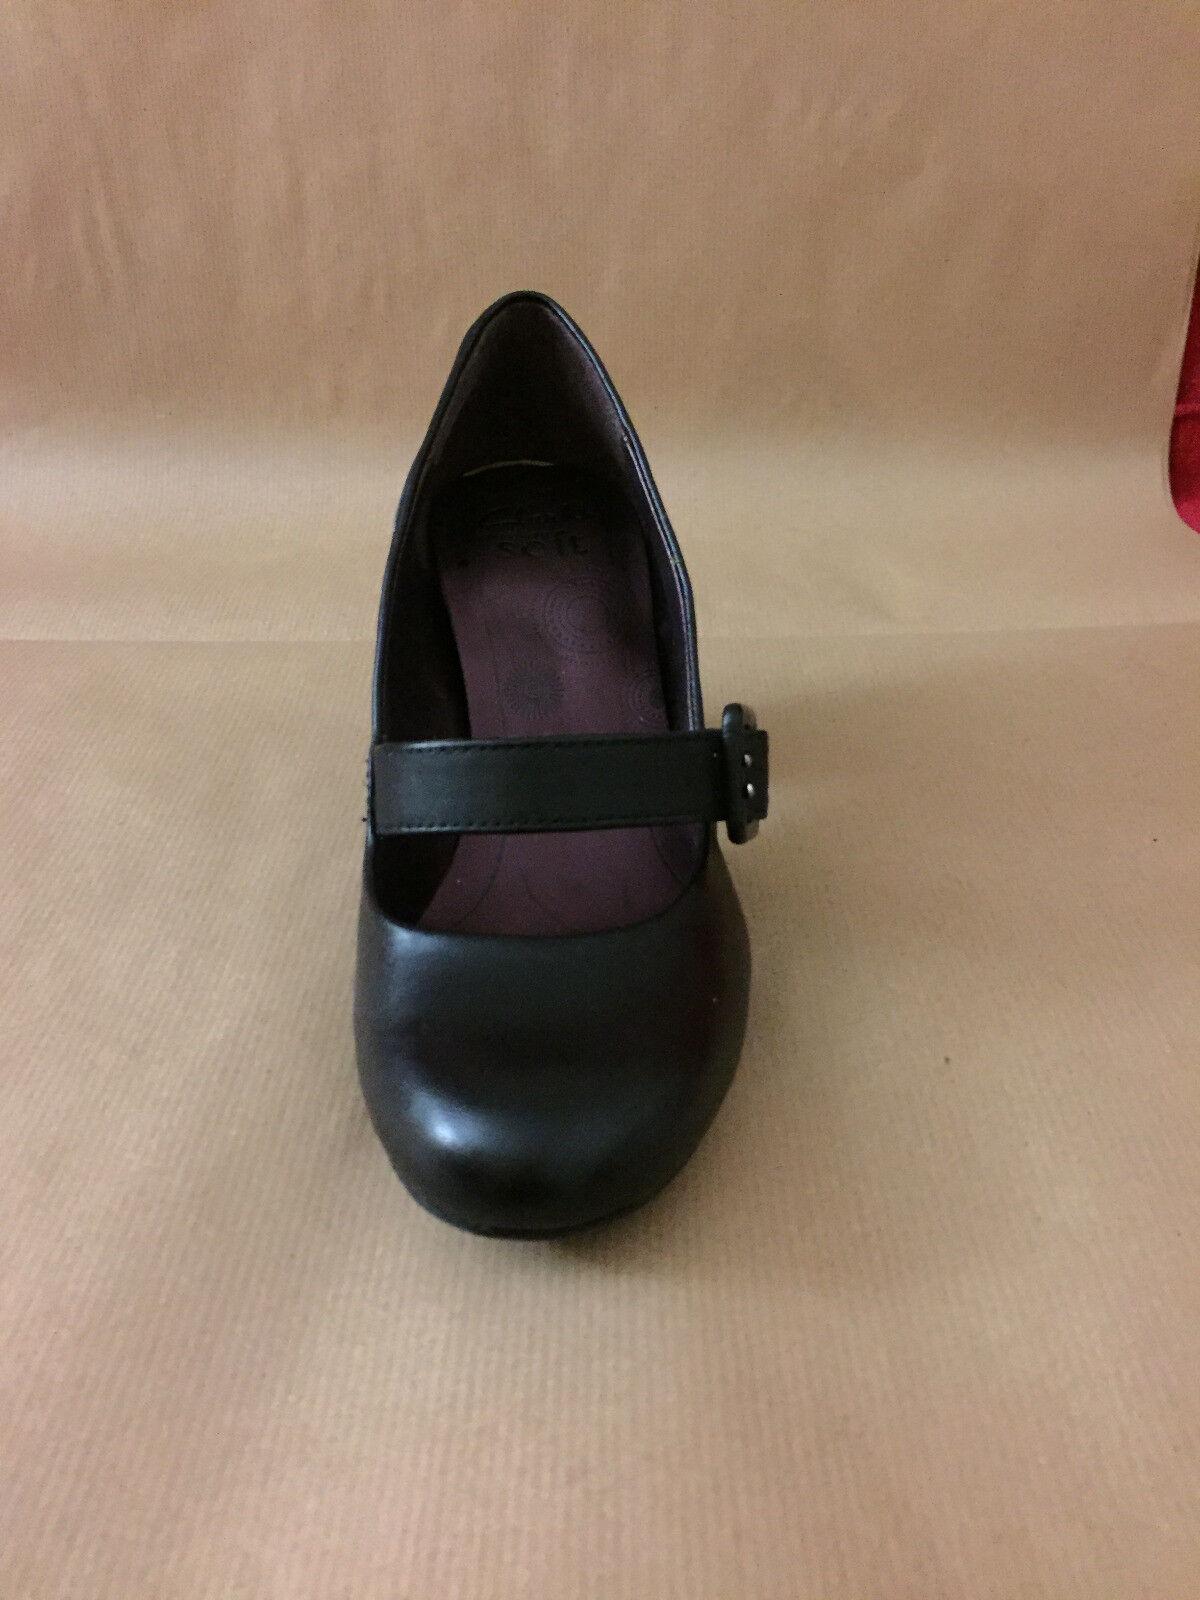 scarpe donna clarks pelle nera n.3  (35.5)